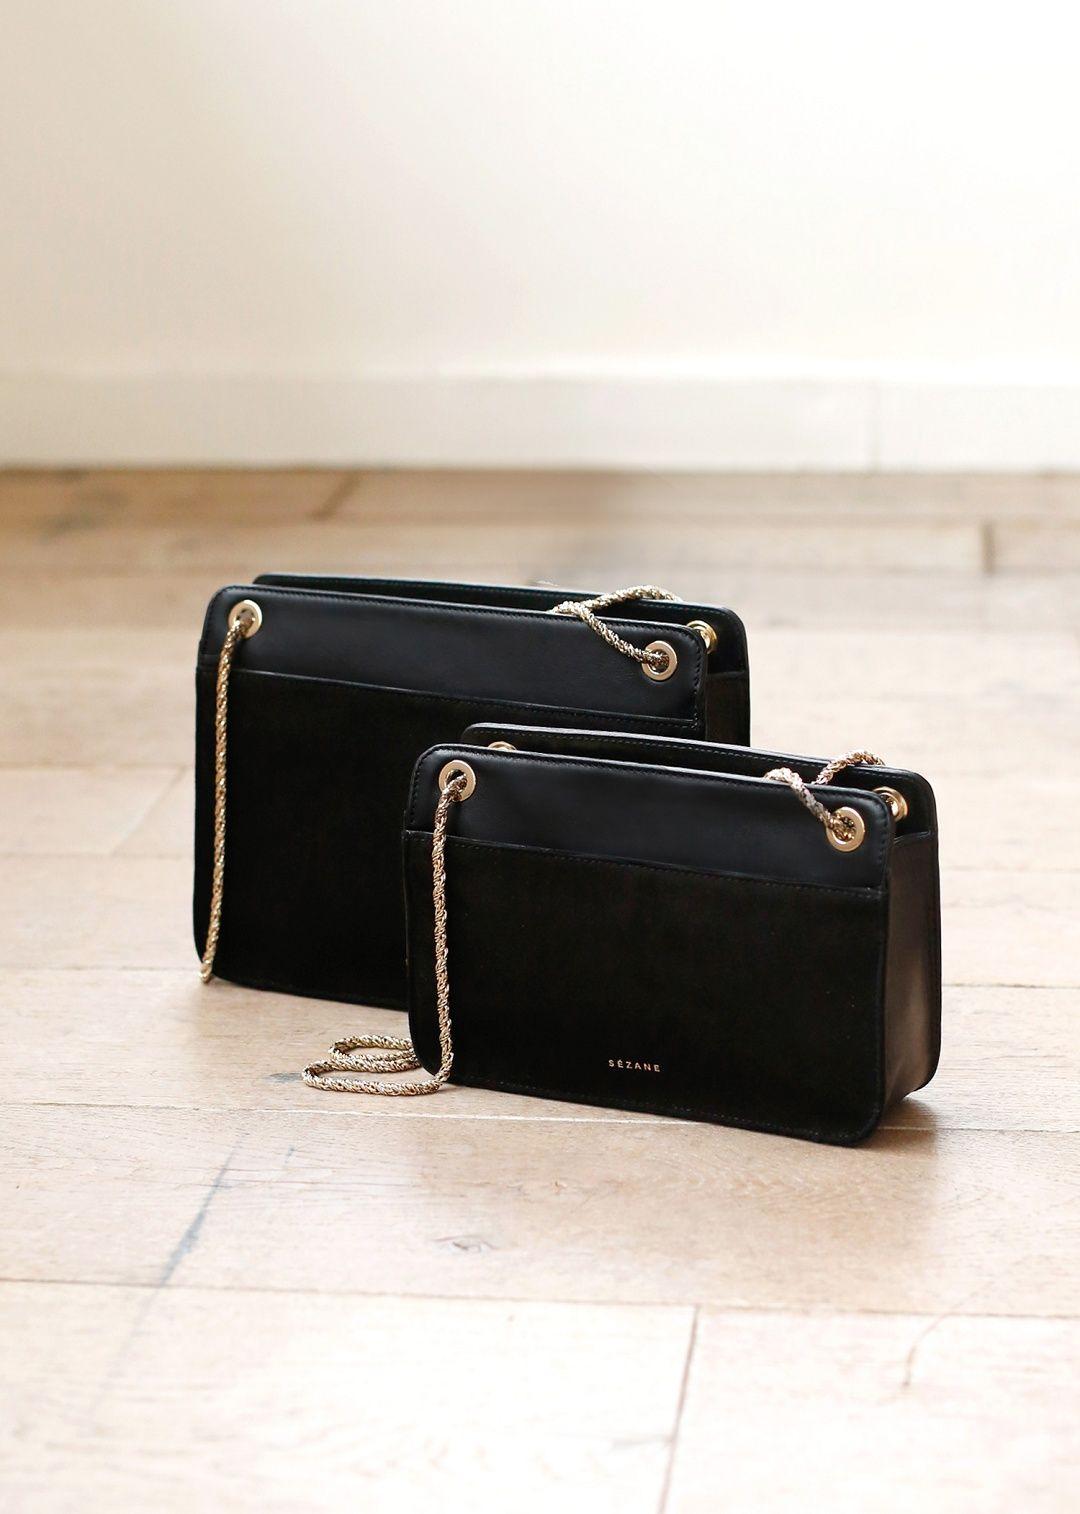 Sézane - Abelle Mini Bag   A LOT of Black, Grey, Oatmeal, and White ... 89f51b22b5cb